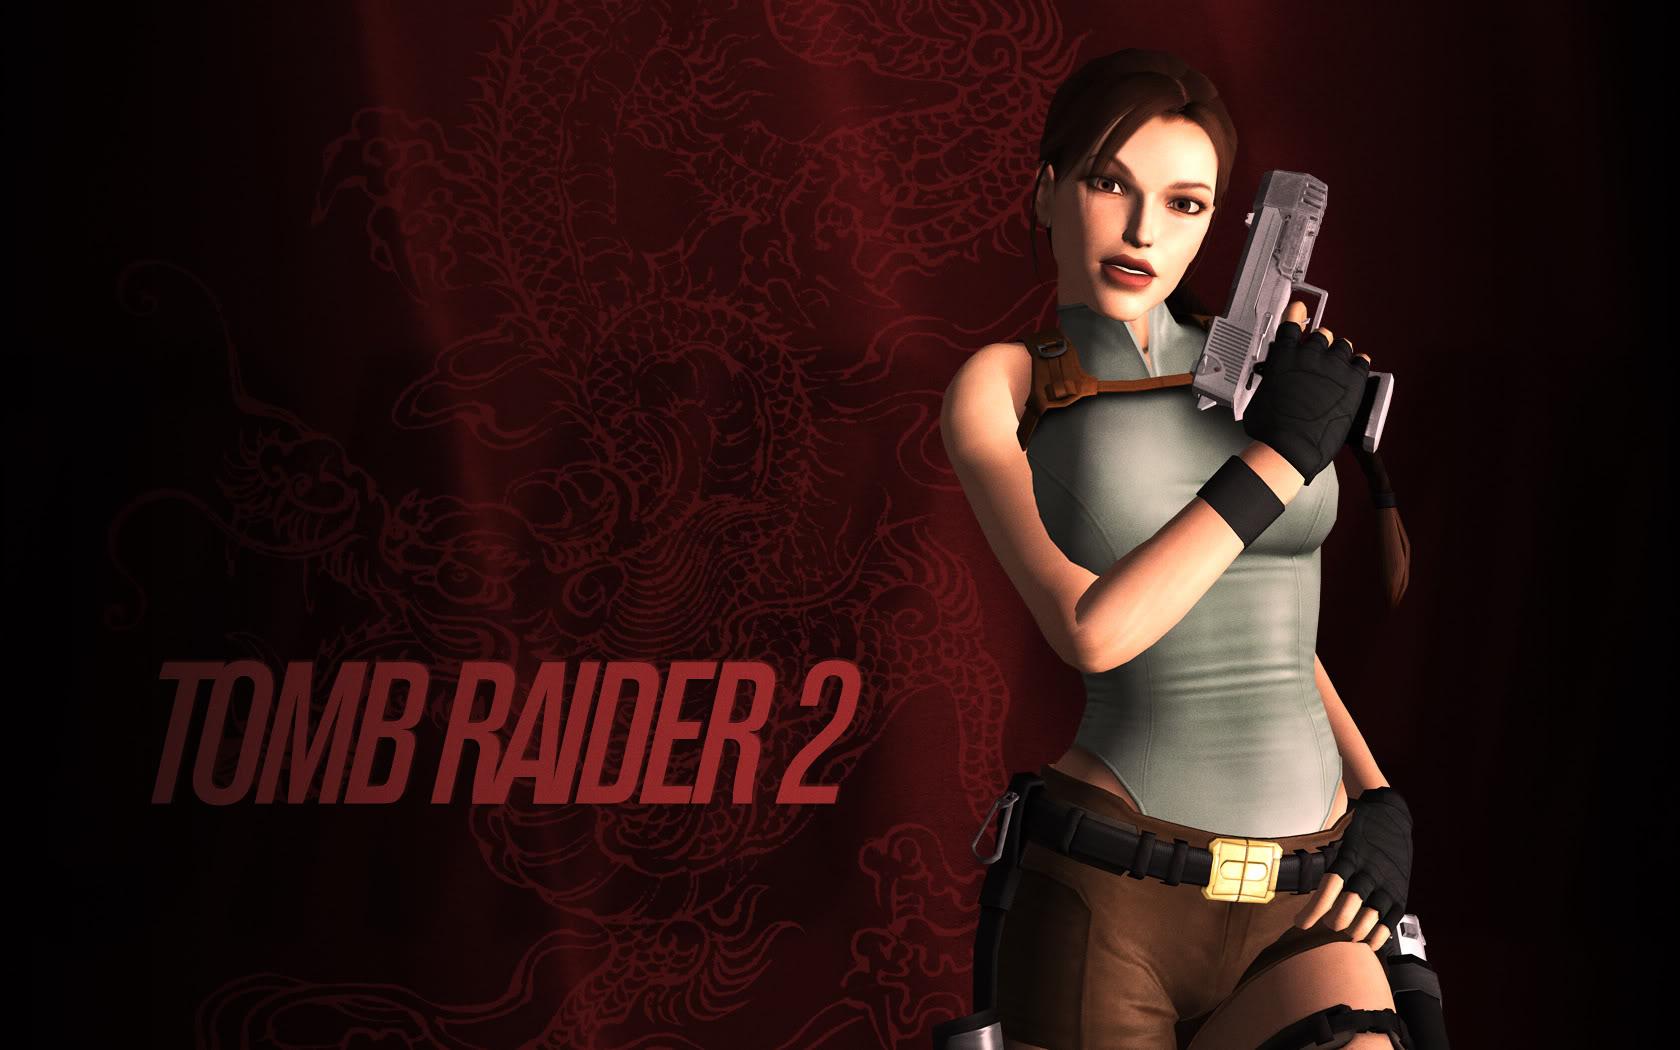 download tomb raider 2